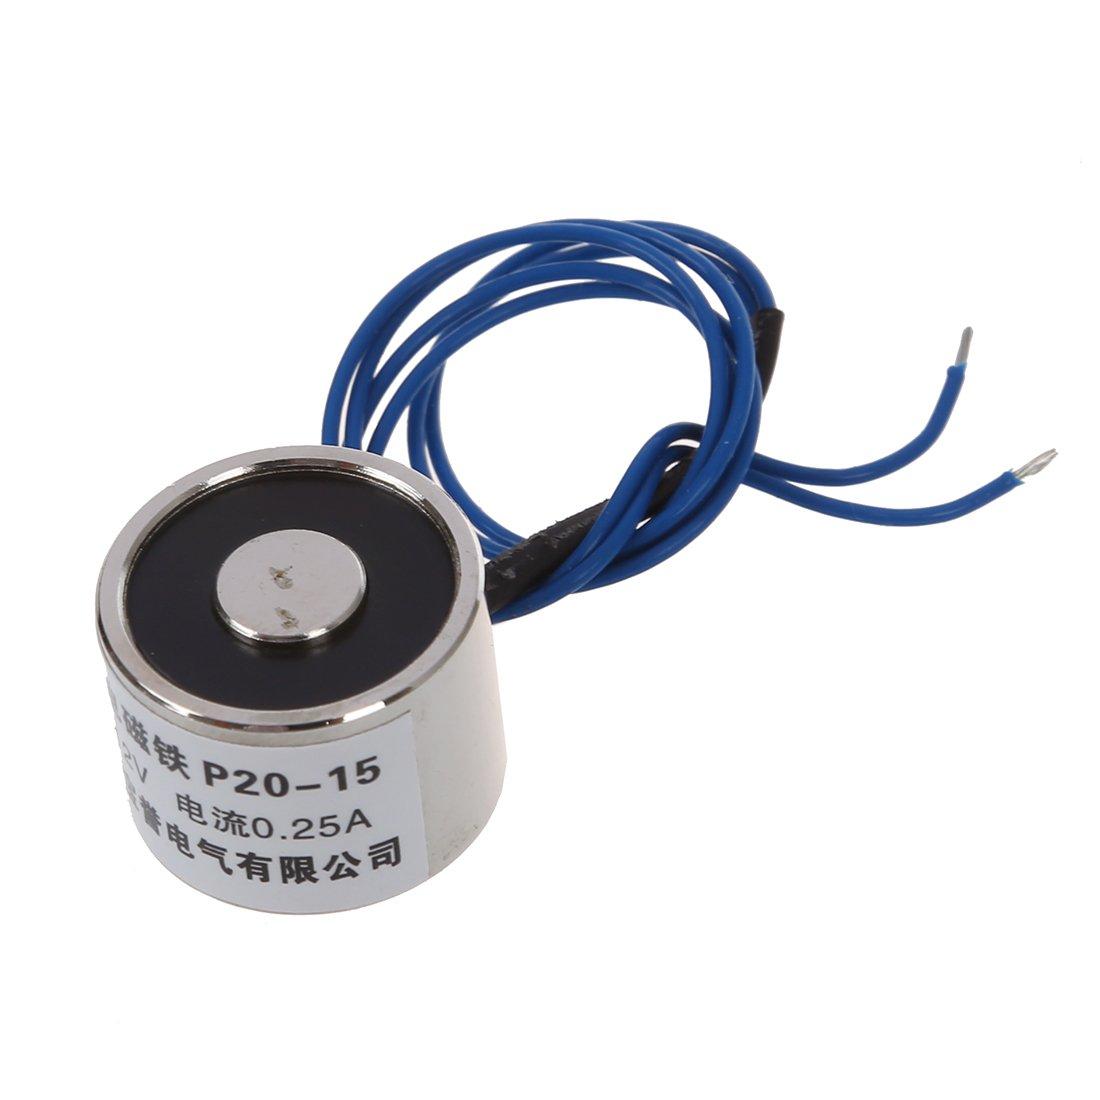 SODIAL (R)5.6lbs DC 12V Holding Electromagnet Lift Solenoid SODIAL(R)